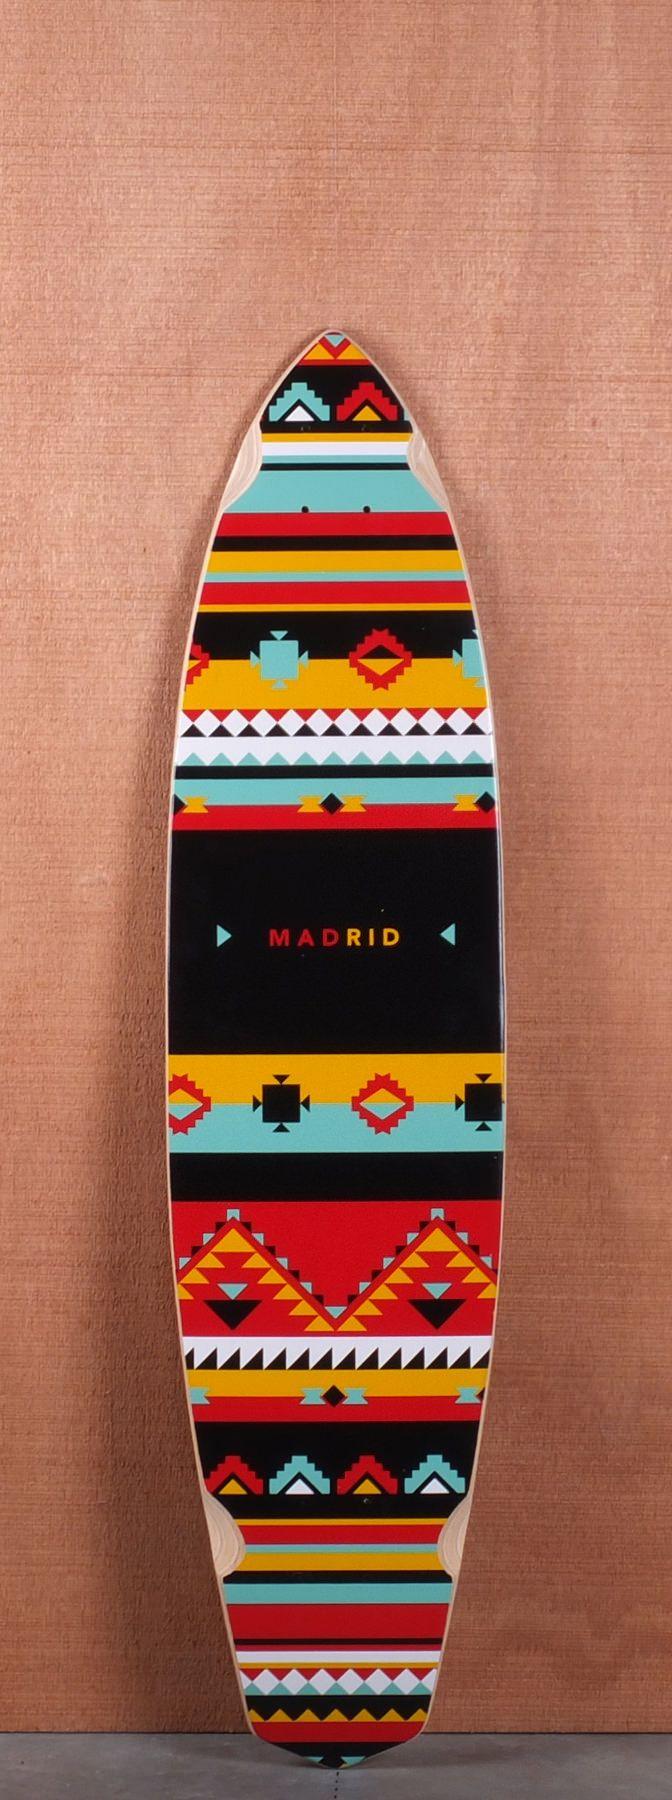 "Madrid 38.75"" Africa #Longboard #Deck | www.boardtrader.com for more boards"